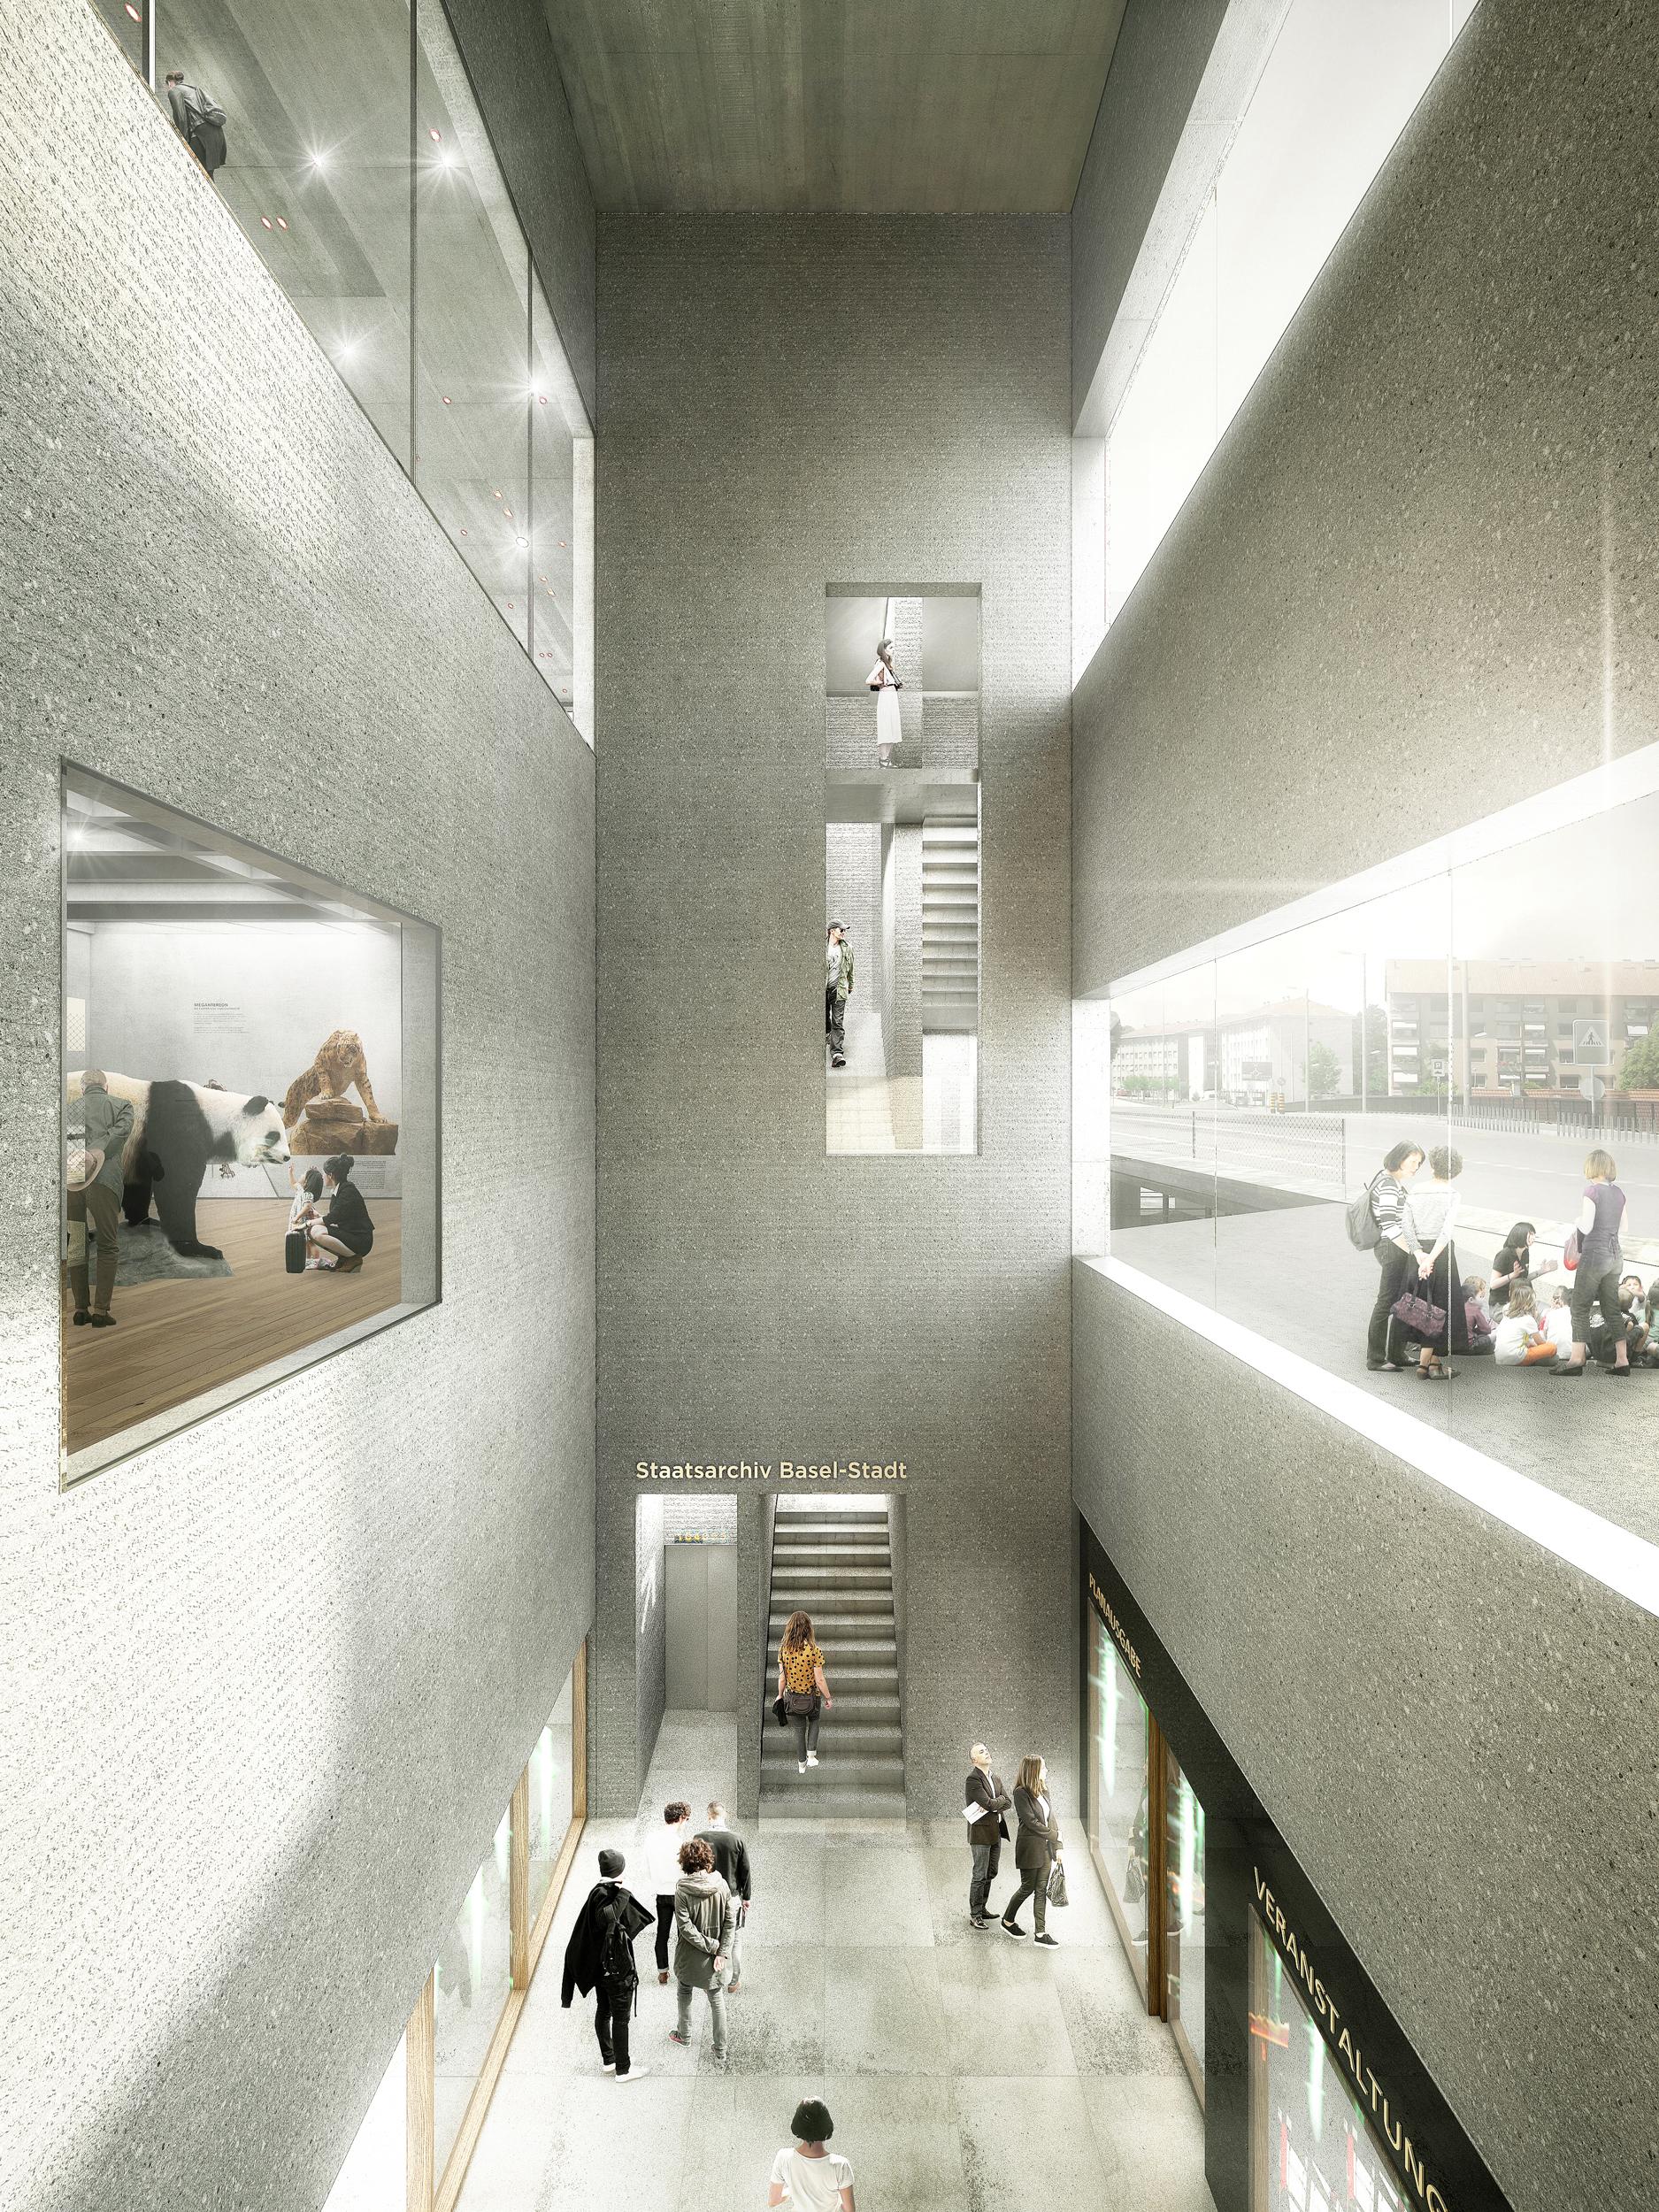 Basel modern museum 28 images barozzi veiga new museum for Changer un robinet exterieur